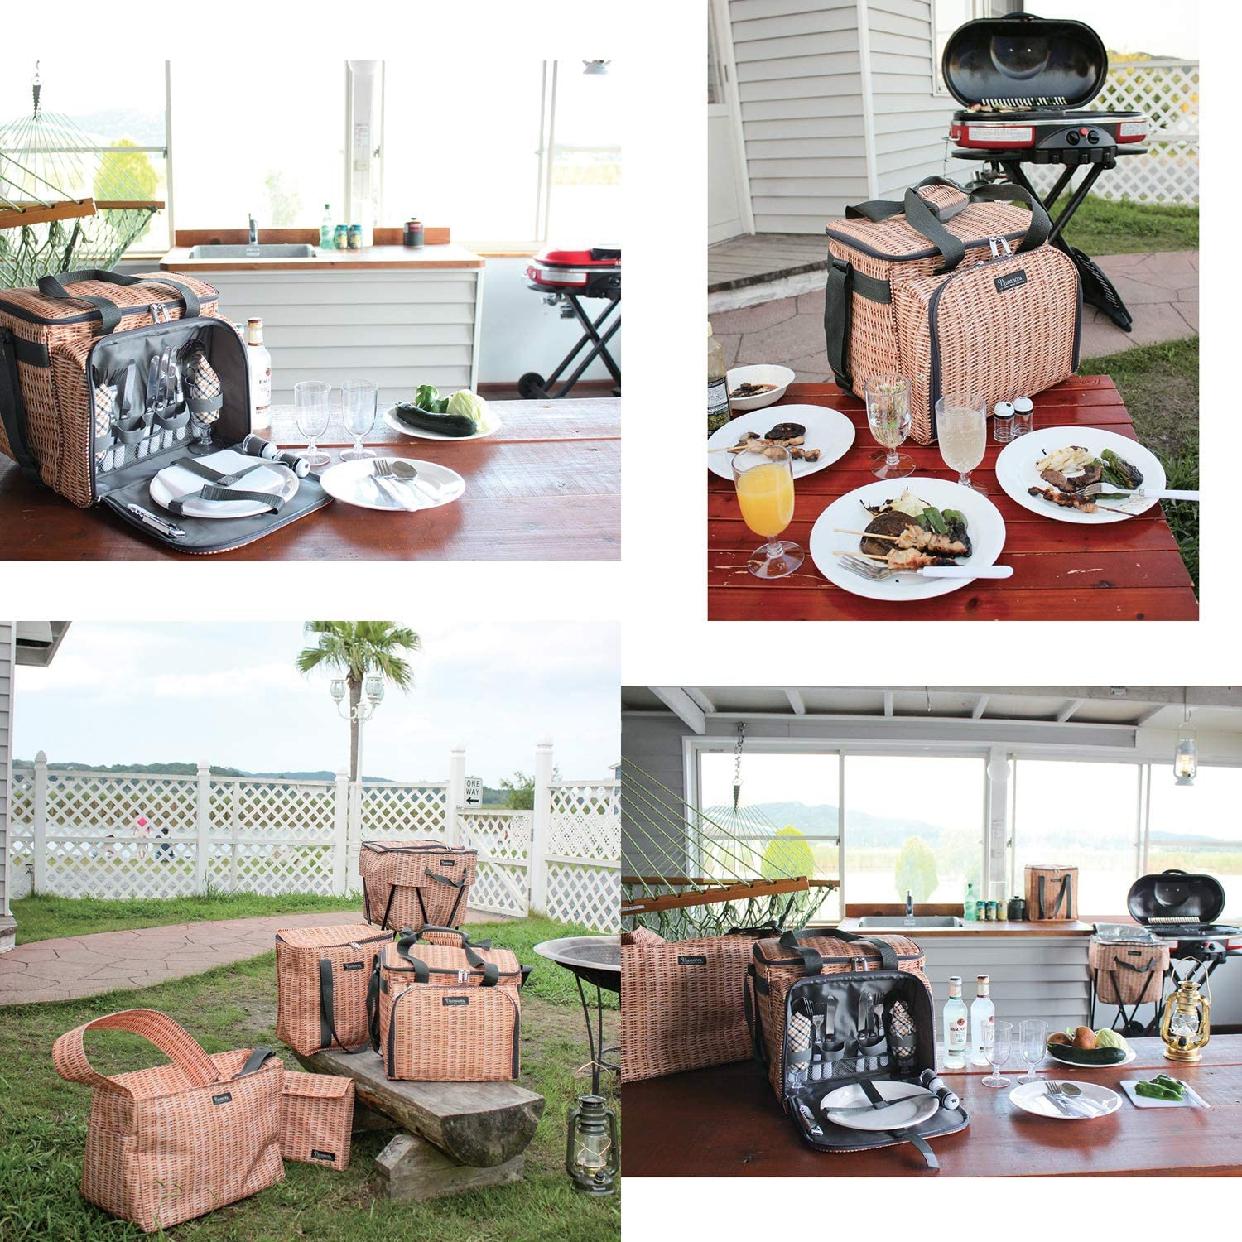 SPICE OF LIFE(スパイスオブライフ)バカンス 4人用食器付きクーラーピクニックバスケット パニエ ブラウン SFVG1611の商品画像5